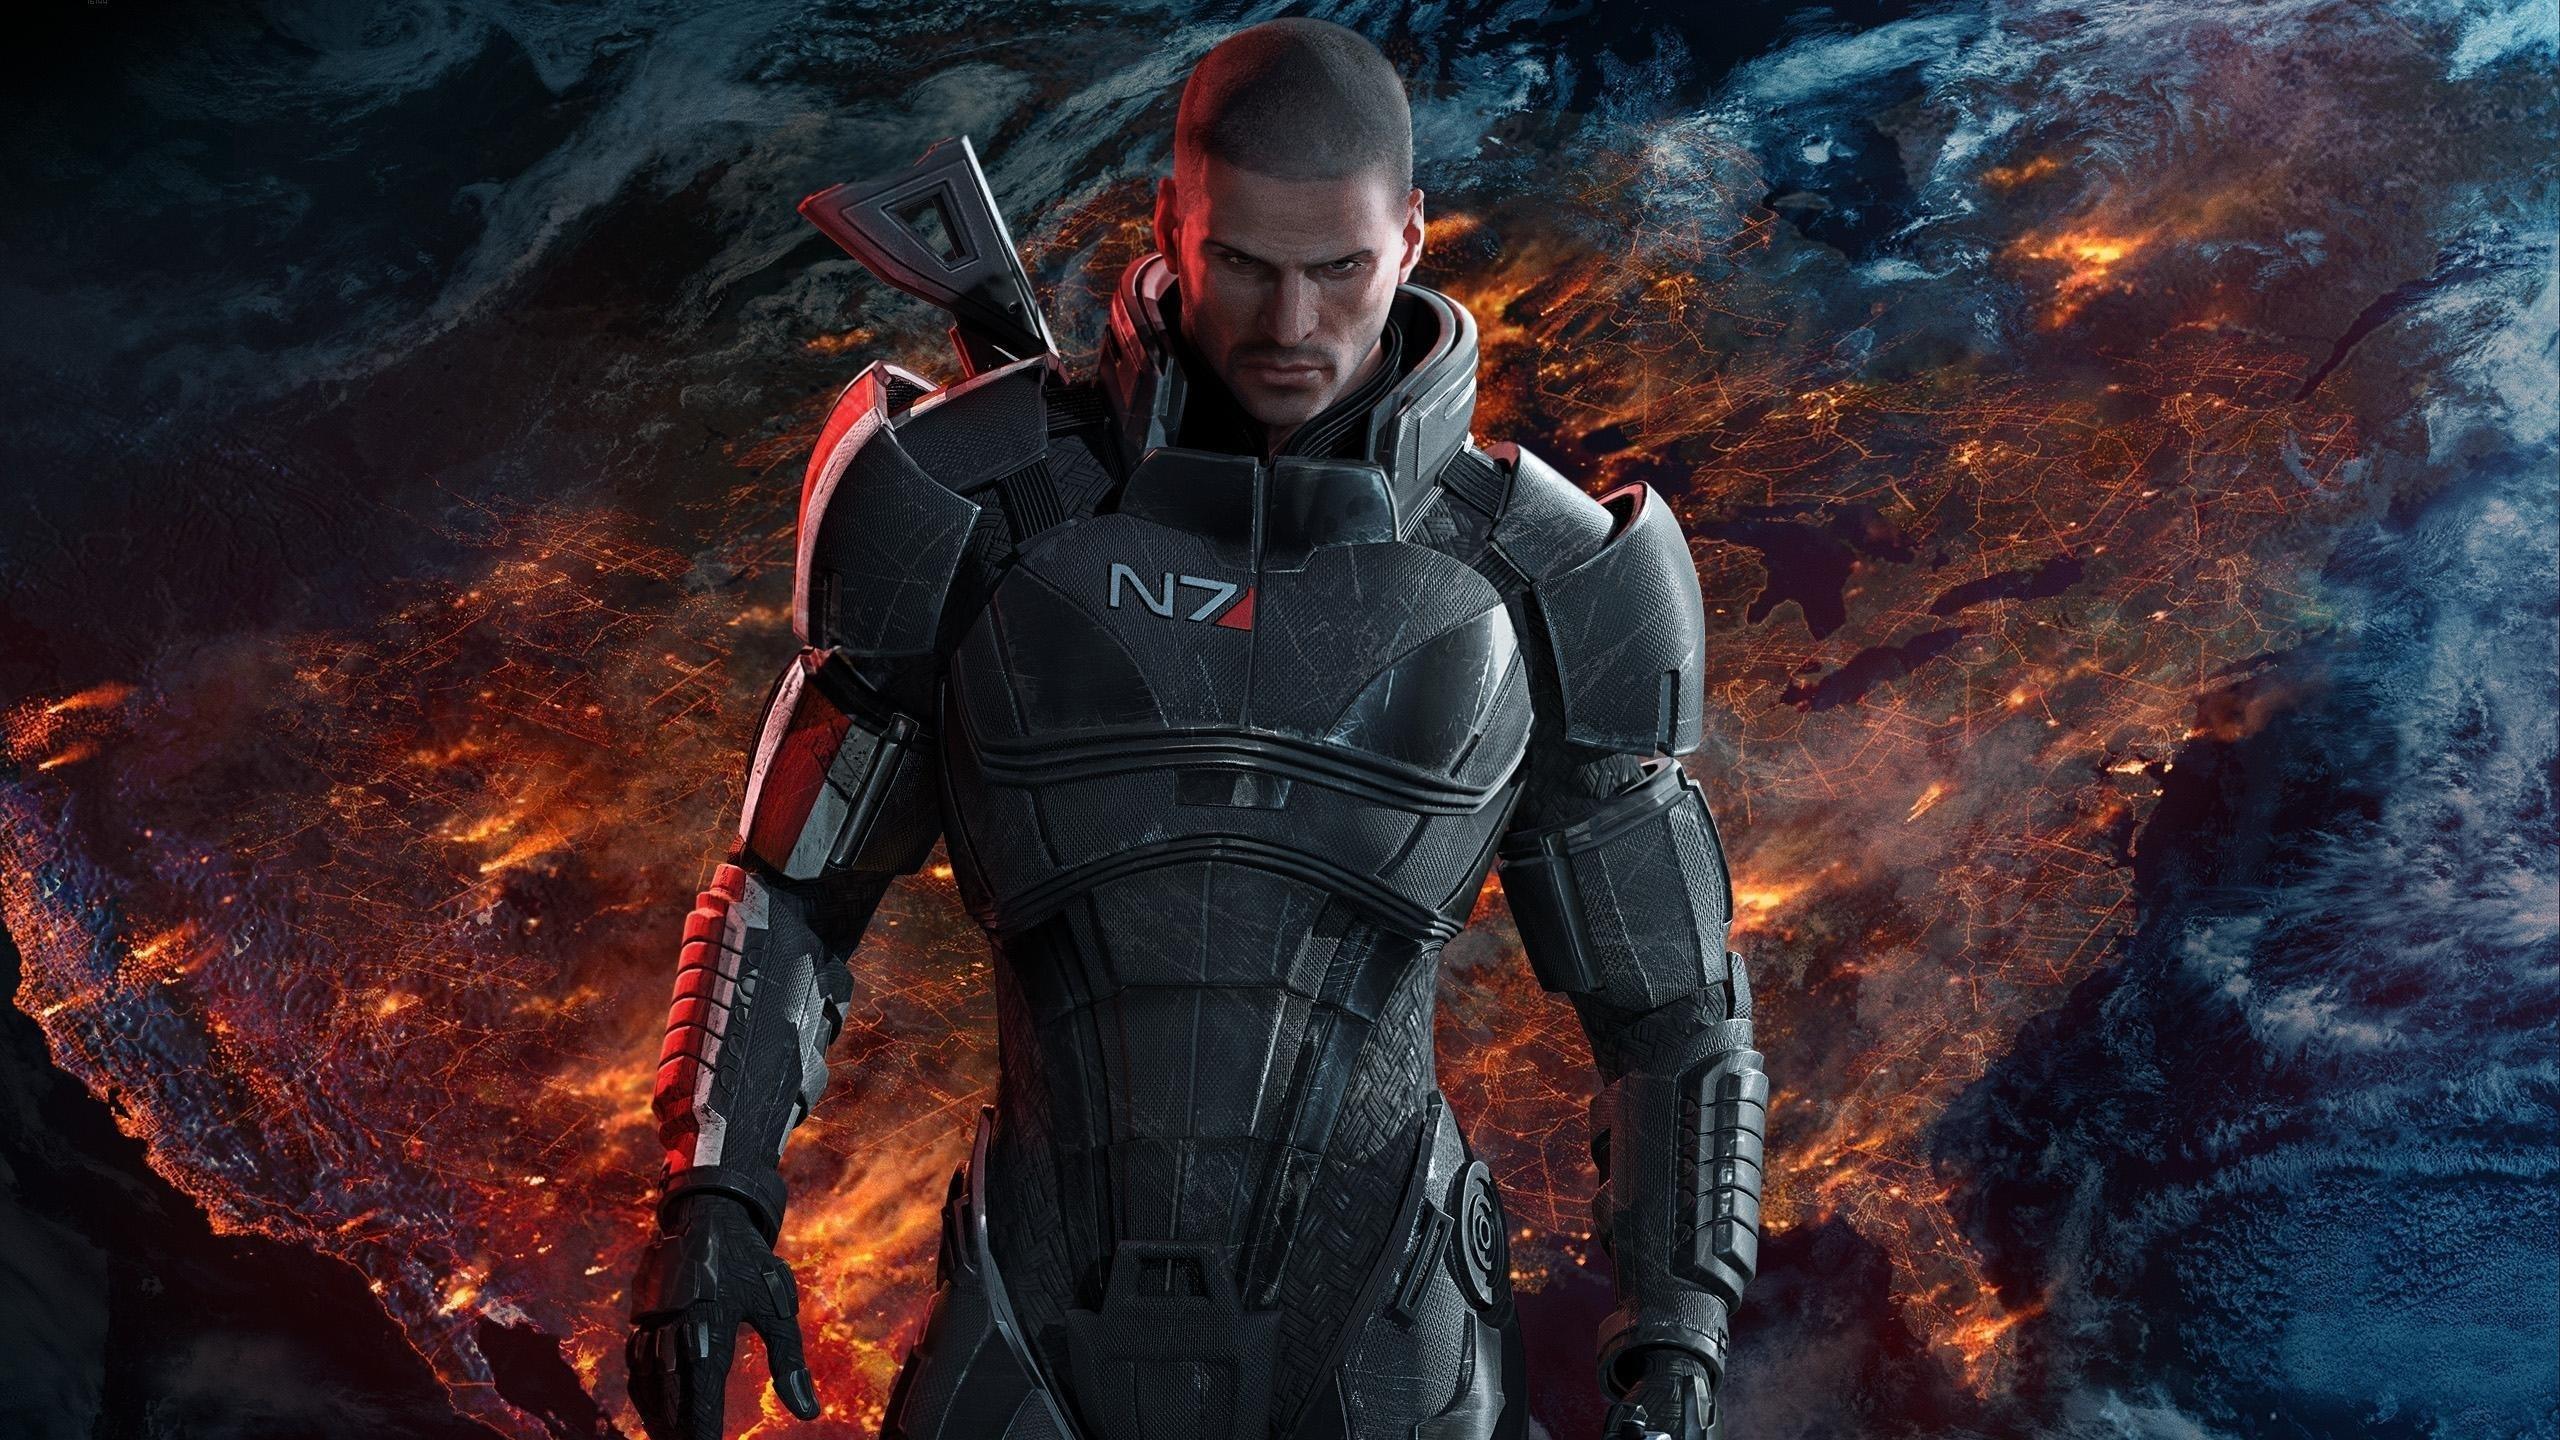 Mass Effect Director Casey Hudson Leaves BioWare